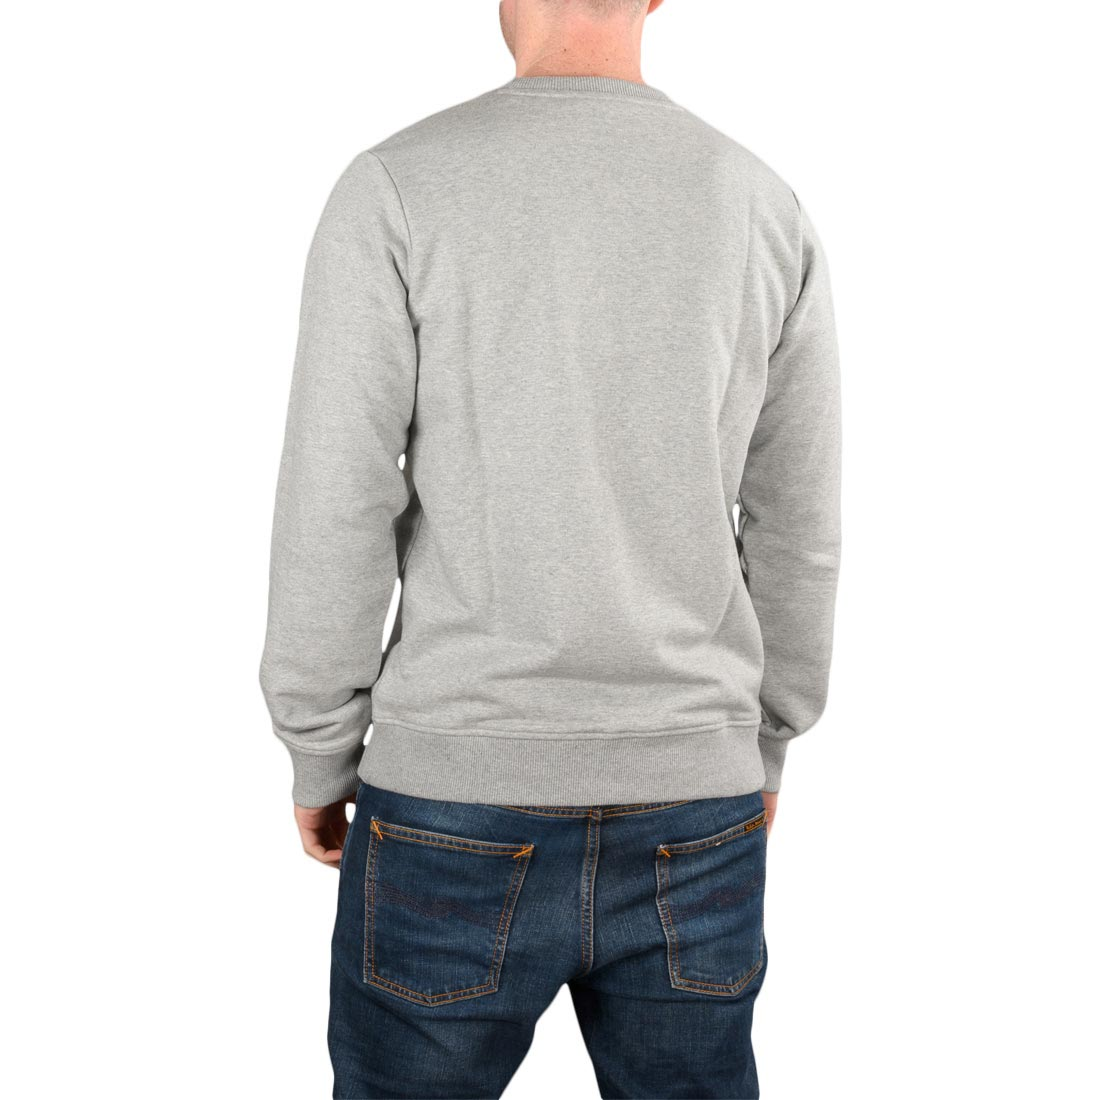 Dickies NEW Men/'s Campton Sweatshirt Grey Melange BNWT